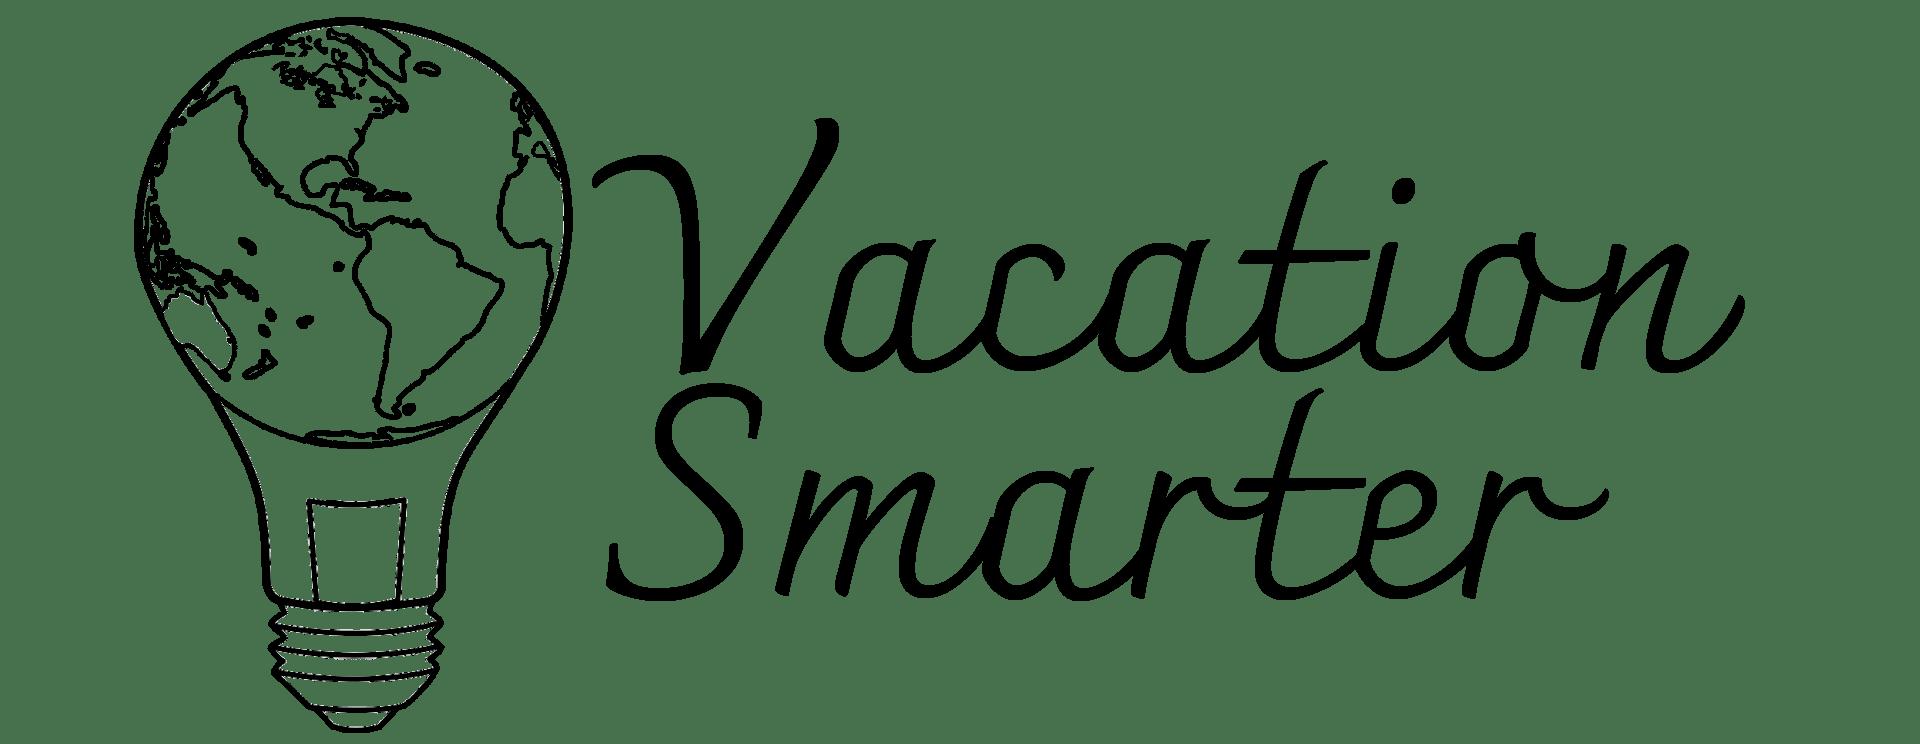 Vacation Smarter